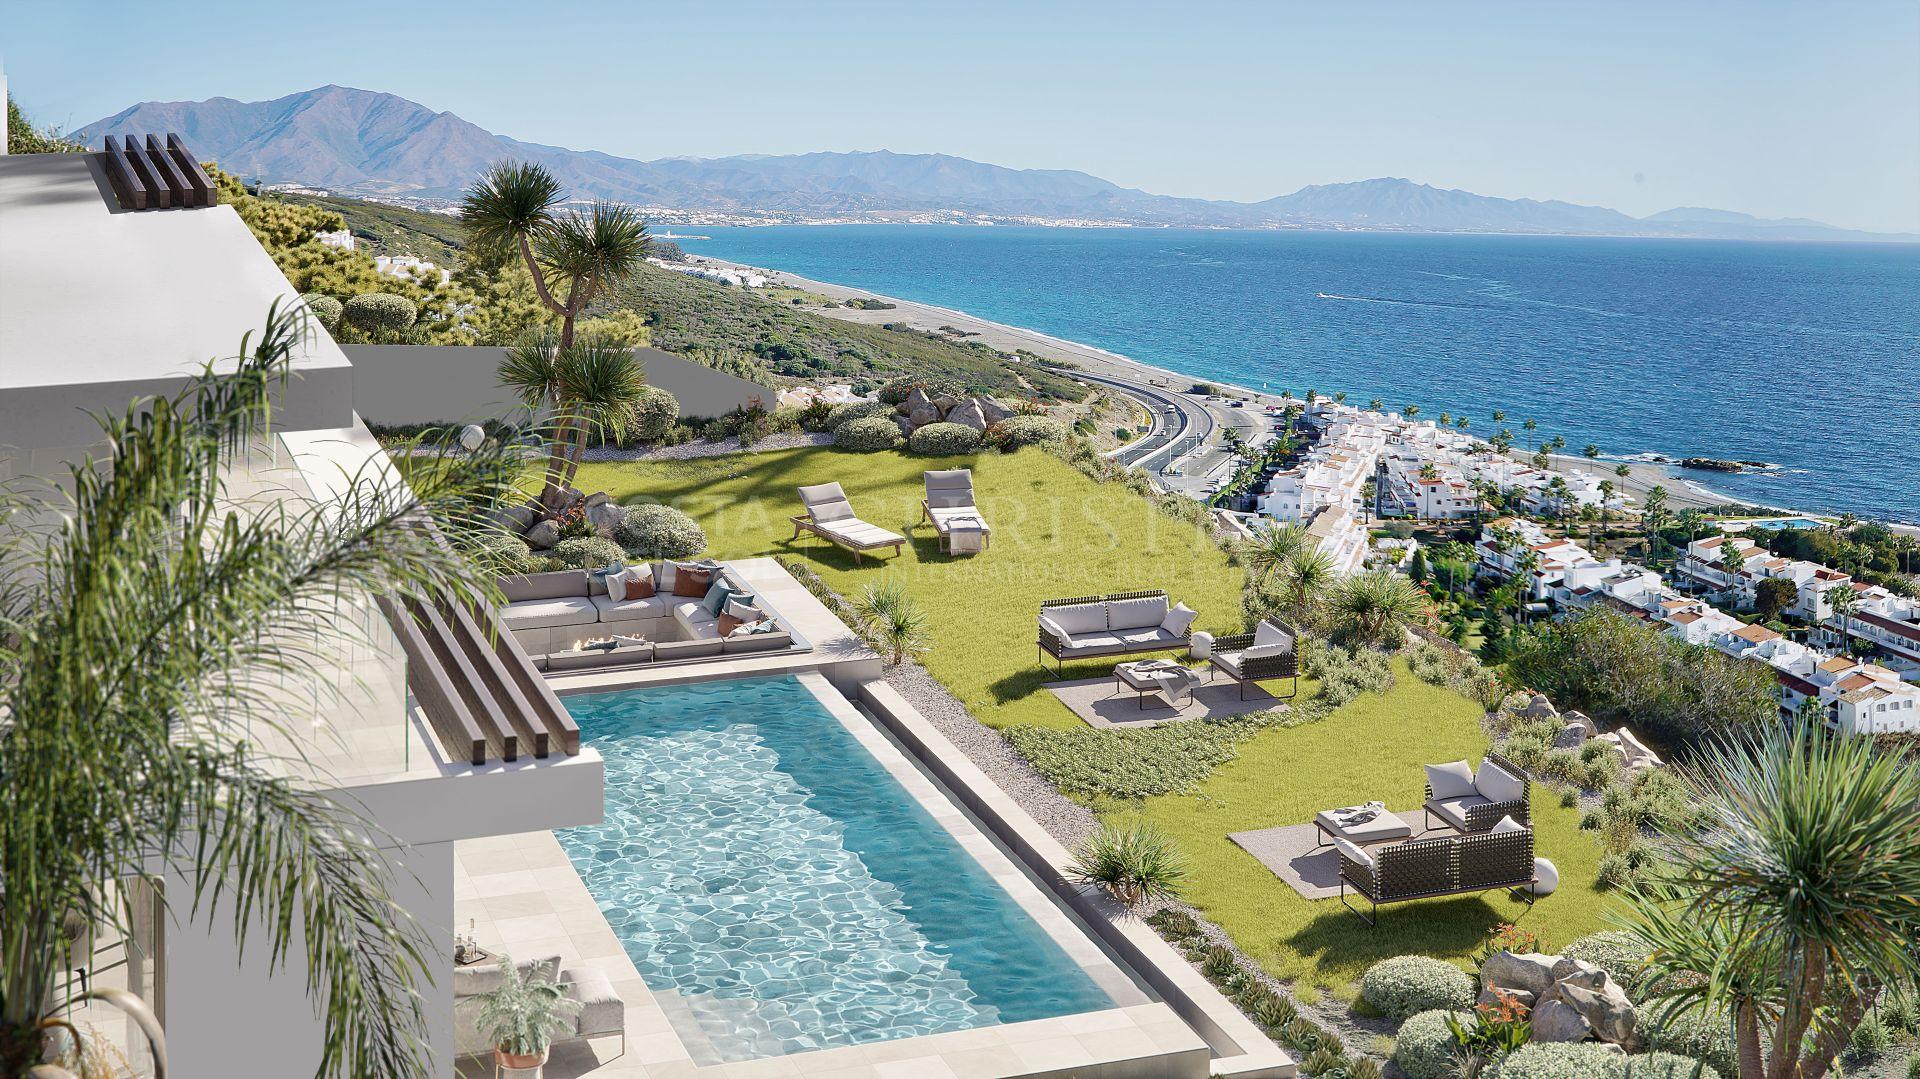 Oceanic, La Duquesa, Manilva - Oceanic, La Duquesa, Manilva   Christie's International Real Estate